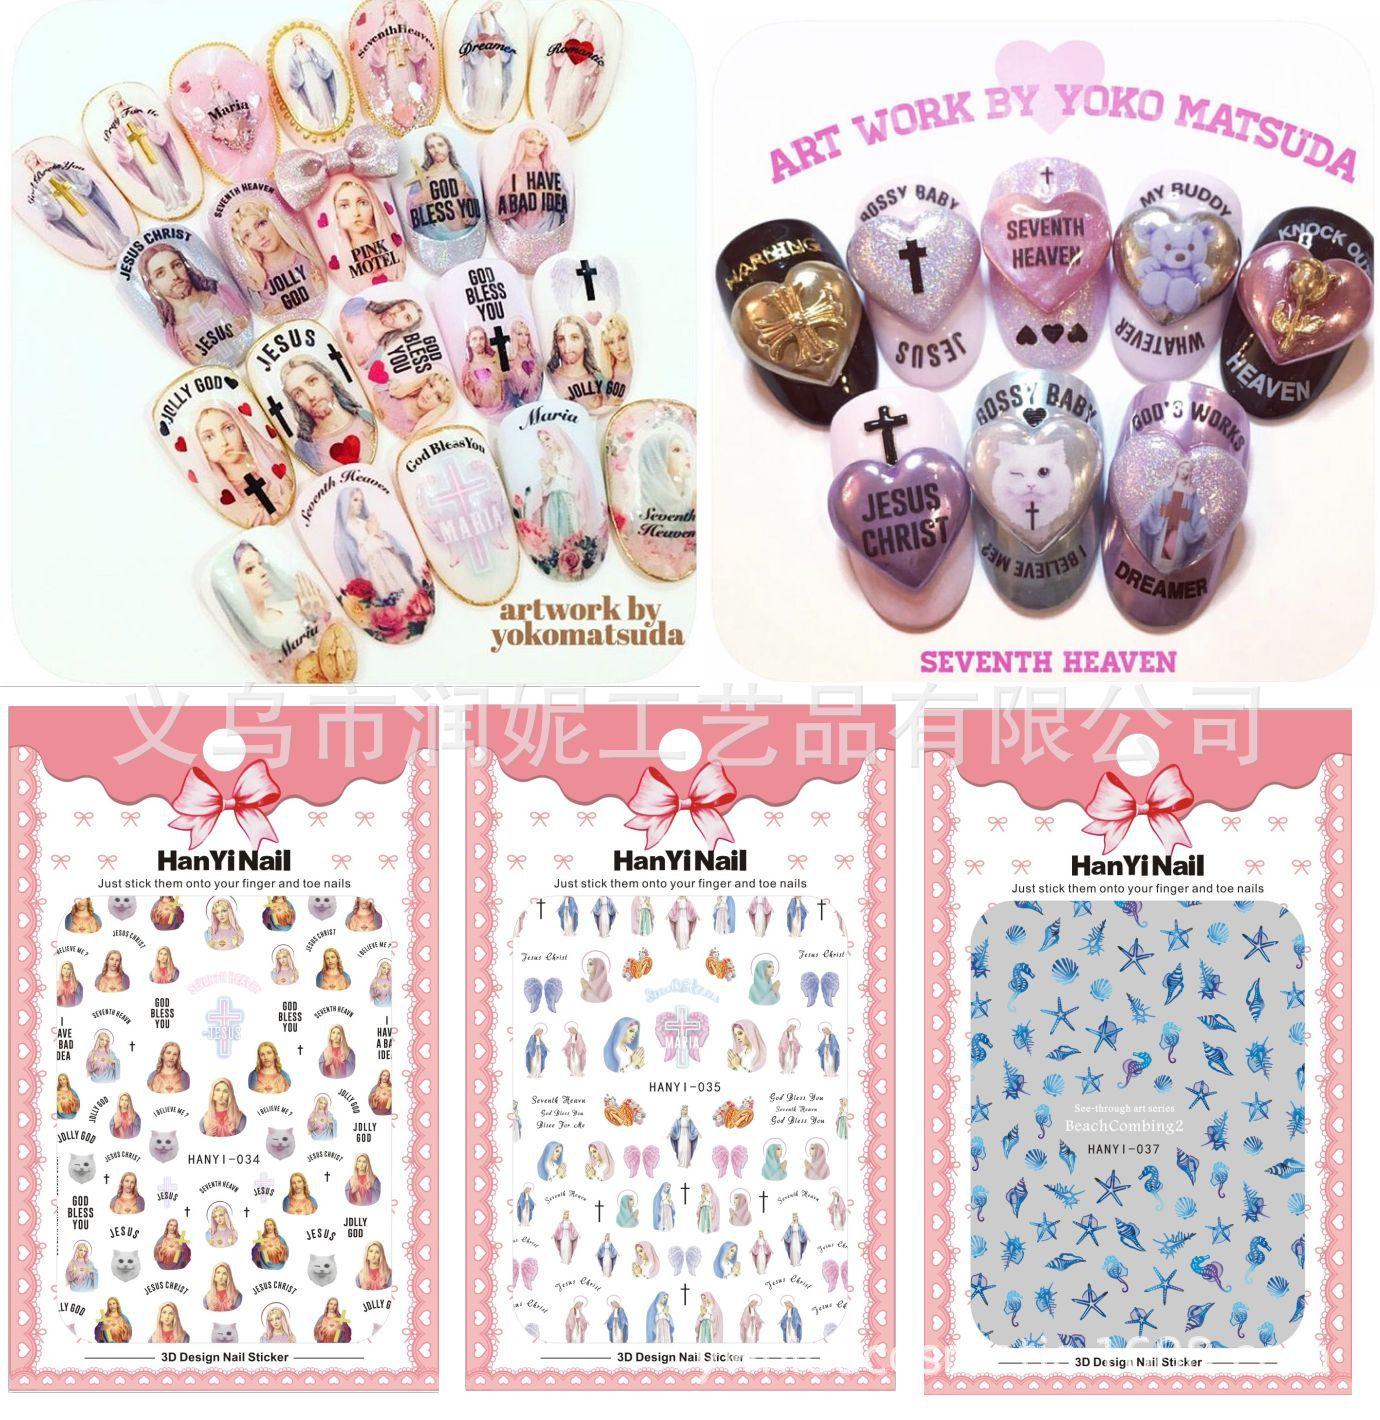 Japanese-style Gum Animal Flower Nail Sticker Hanyinail 01-065